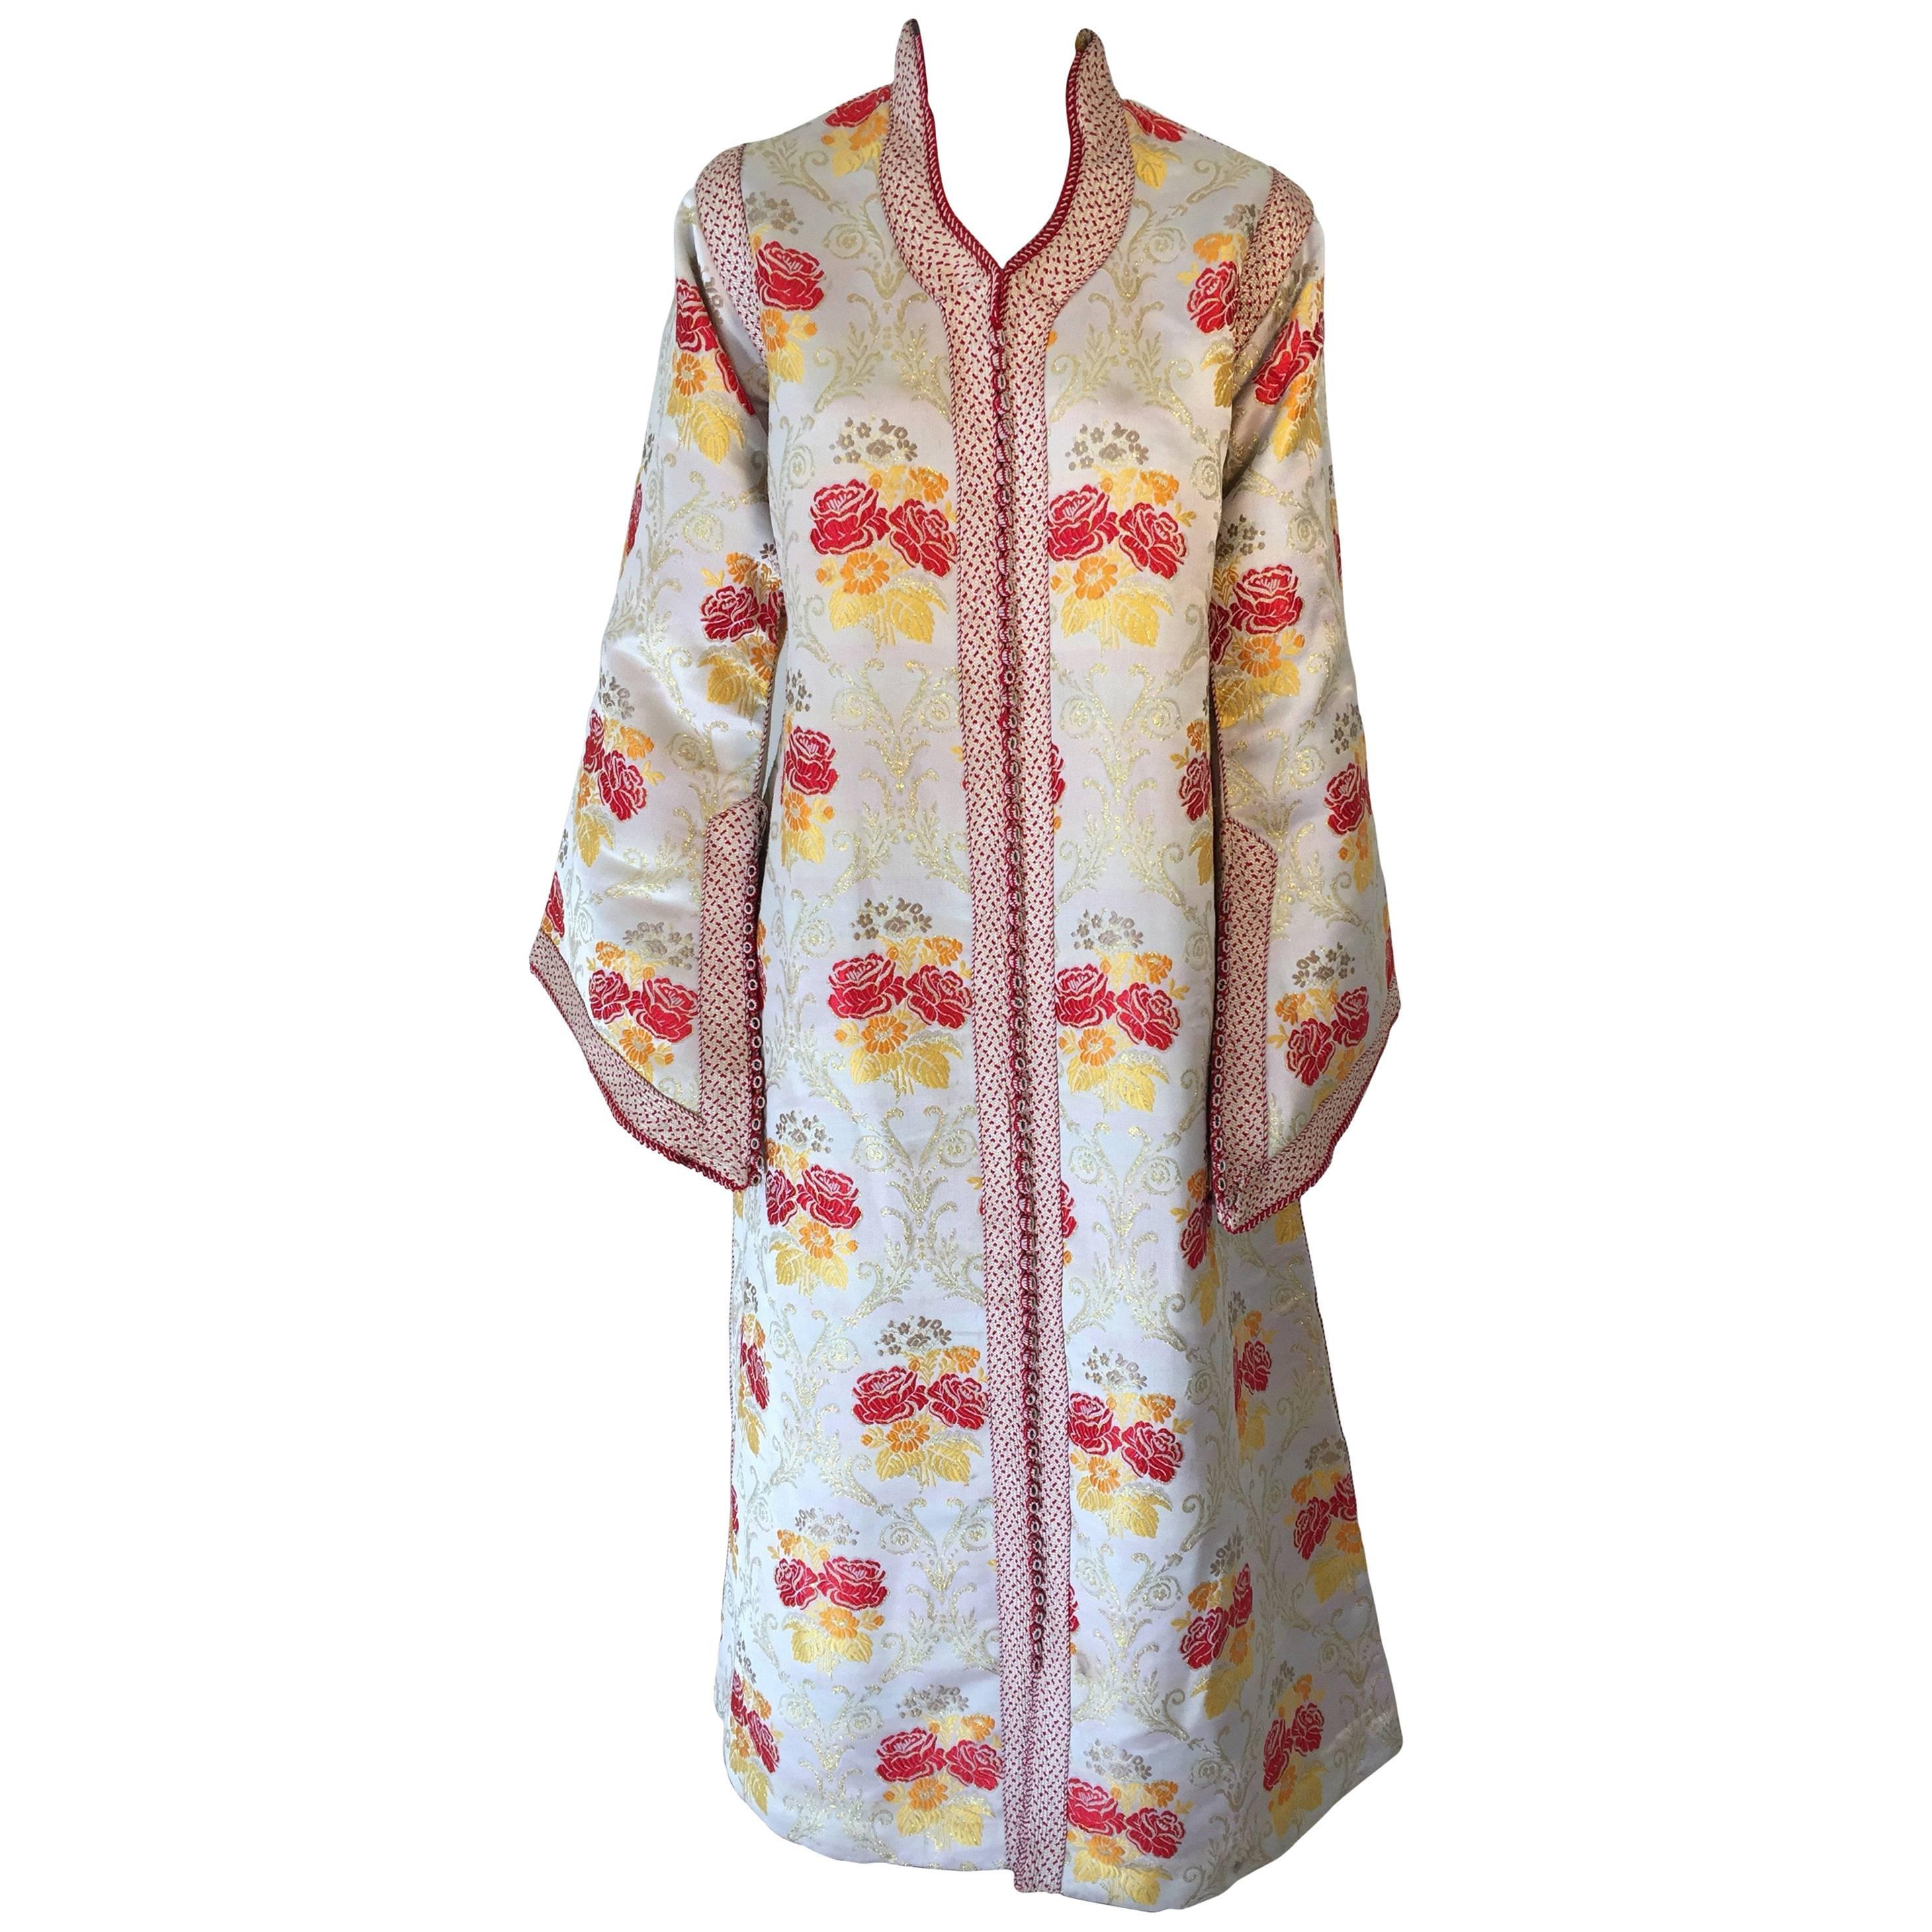 Moroccan Brocade Caftan Maxi Dress Kaftan Handmade in Morocco Africa